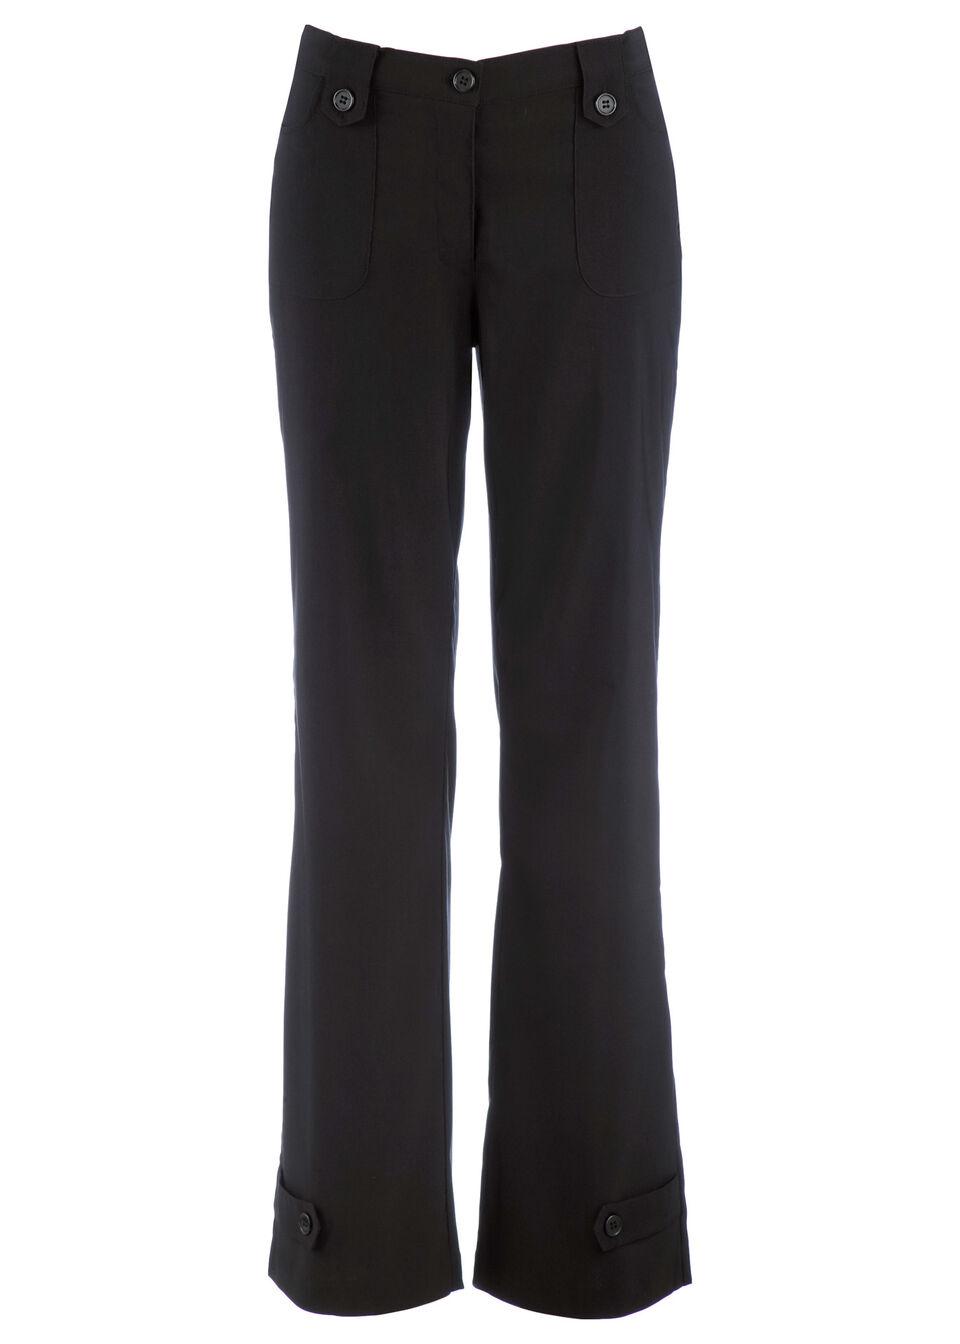 Pantaloni-stretch Bengalin, drepţi bonprix de la bpc bonprix collection